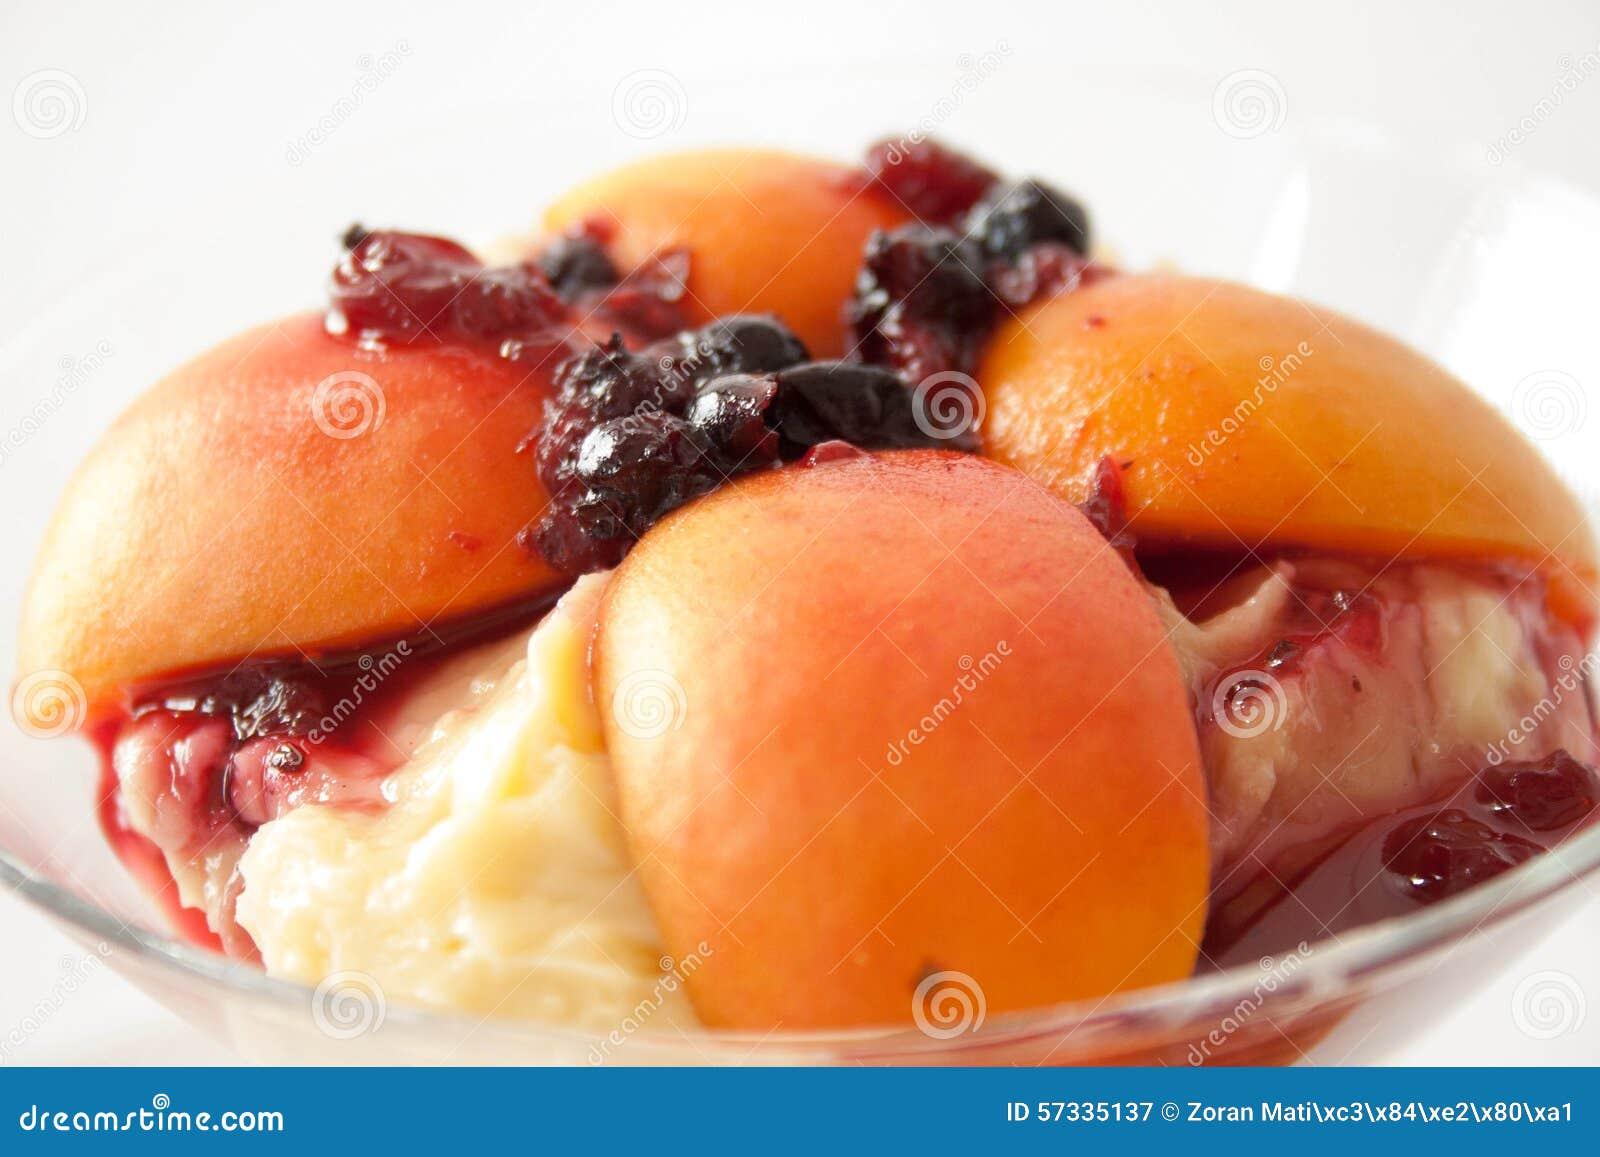 Fruitcocktail met abrikozen